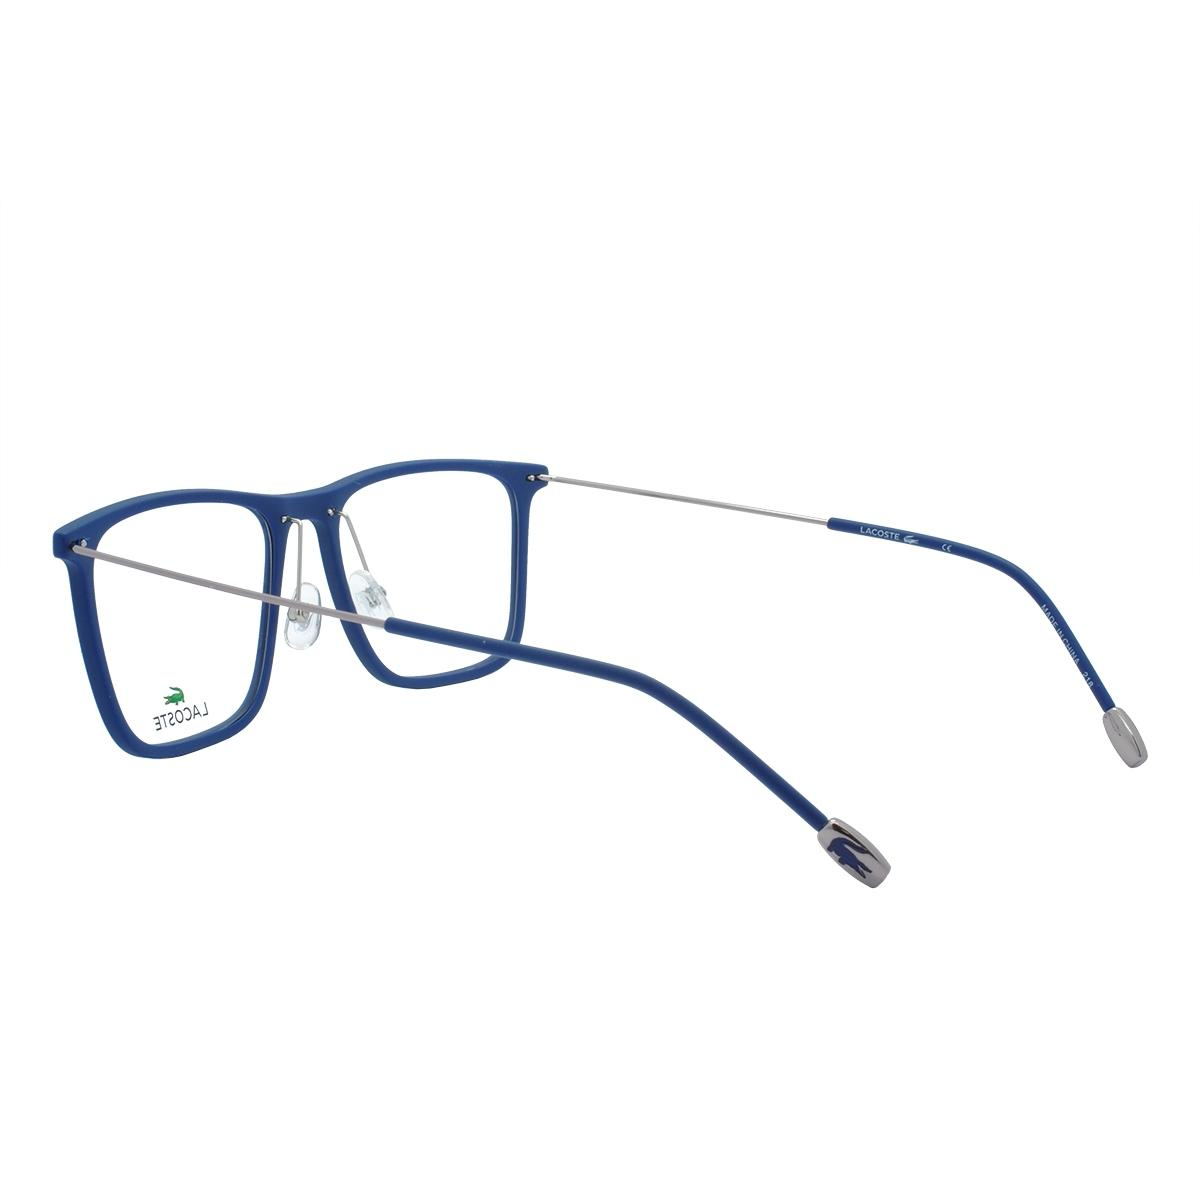 całkiem tania szybka dostawa kup tanio Óculos de Grau Lacoste Masculino L2829 424 - Acetato Azul